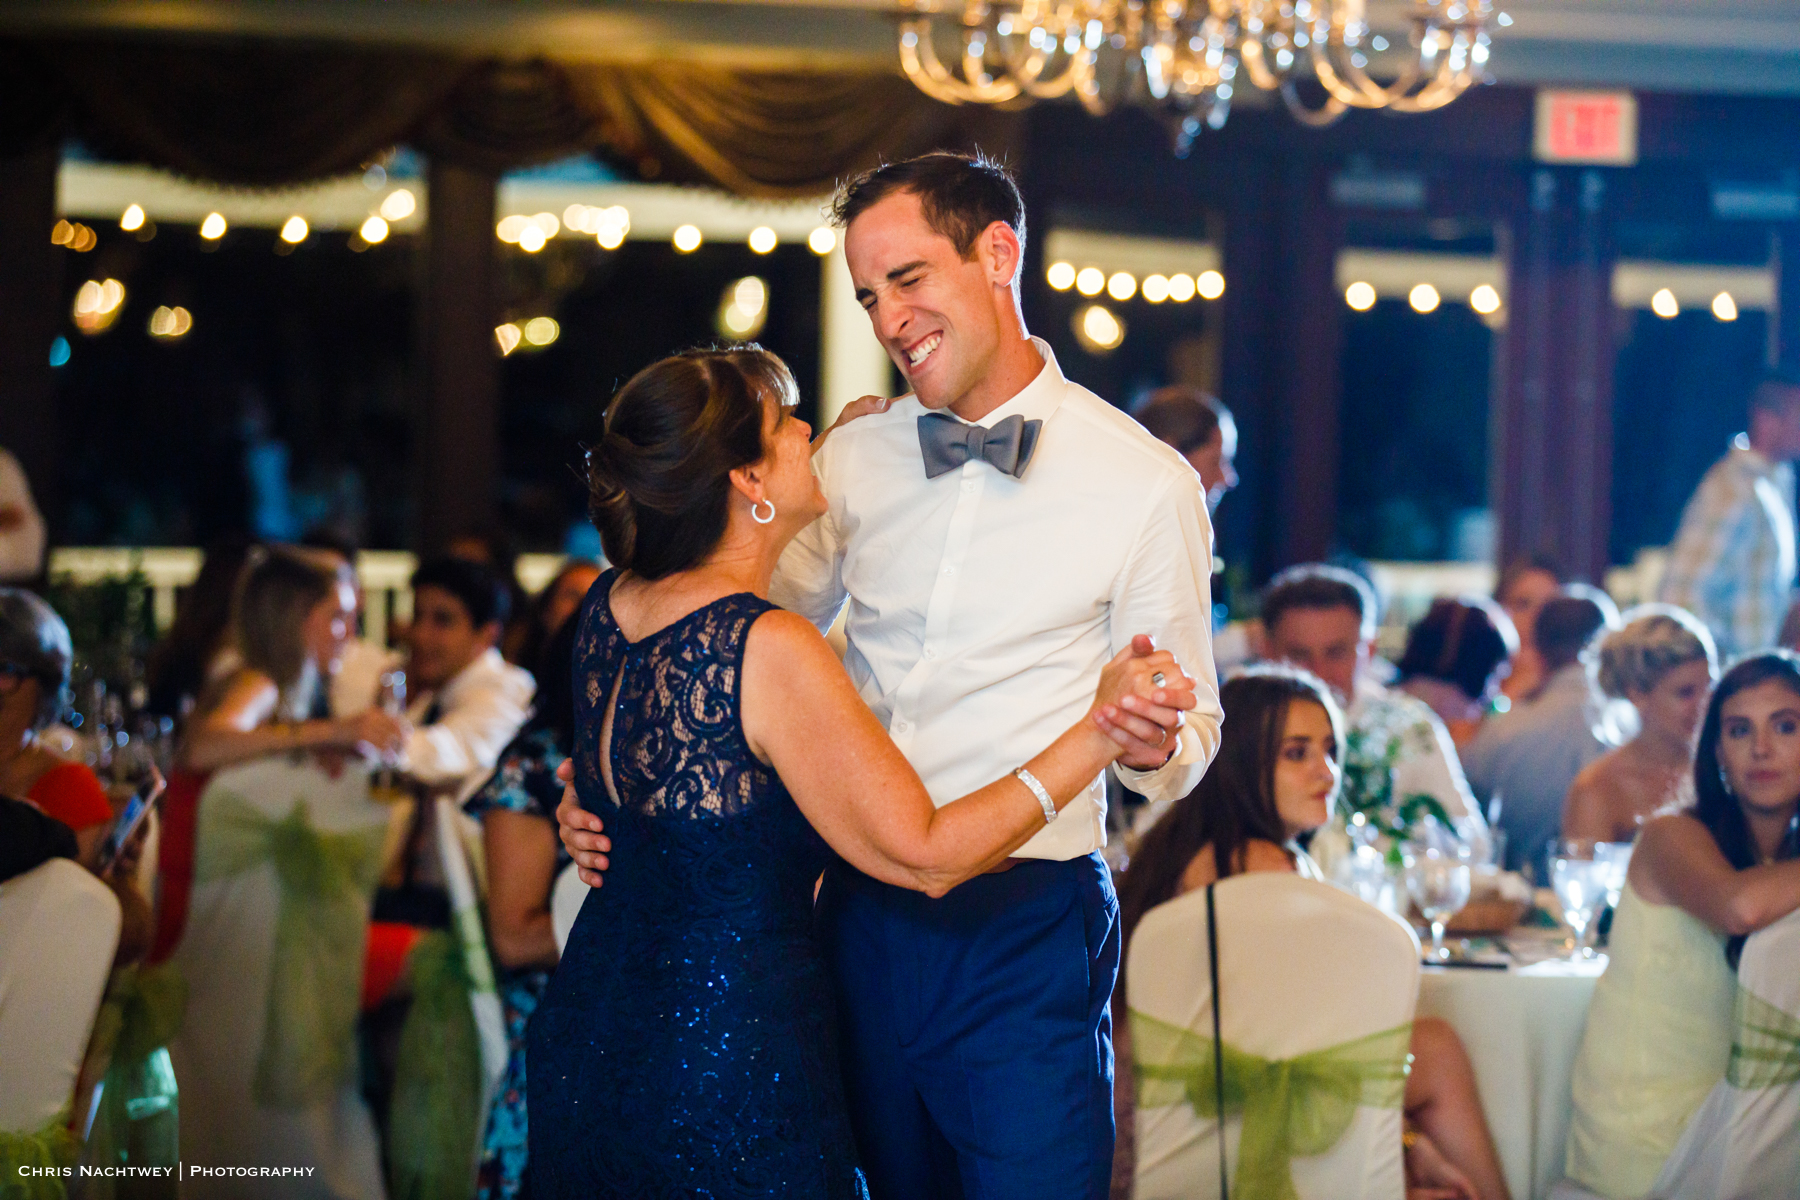 photos-wedding-quidnessett-country-club-ri-chris-nachtwey-photography-2018-54.jpg